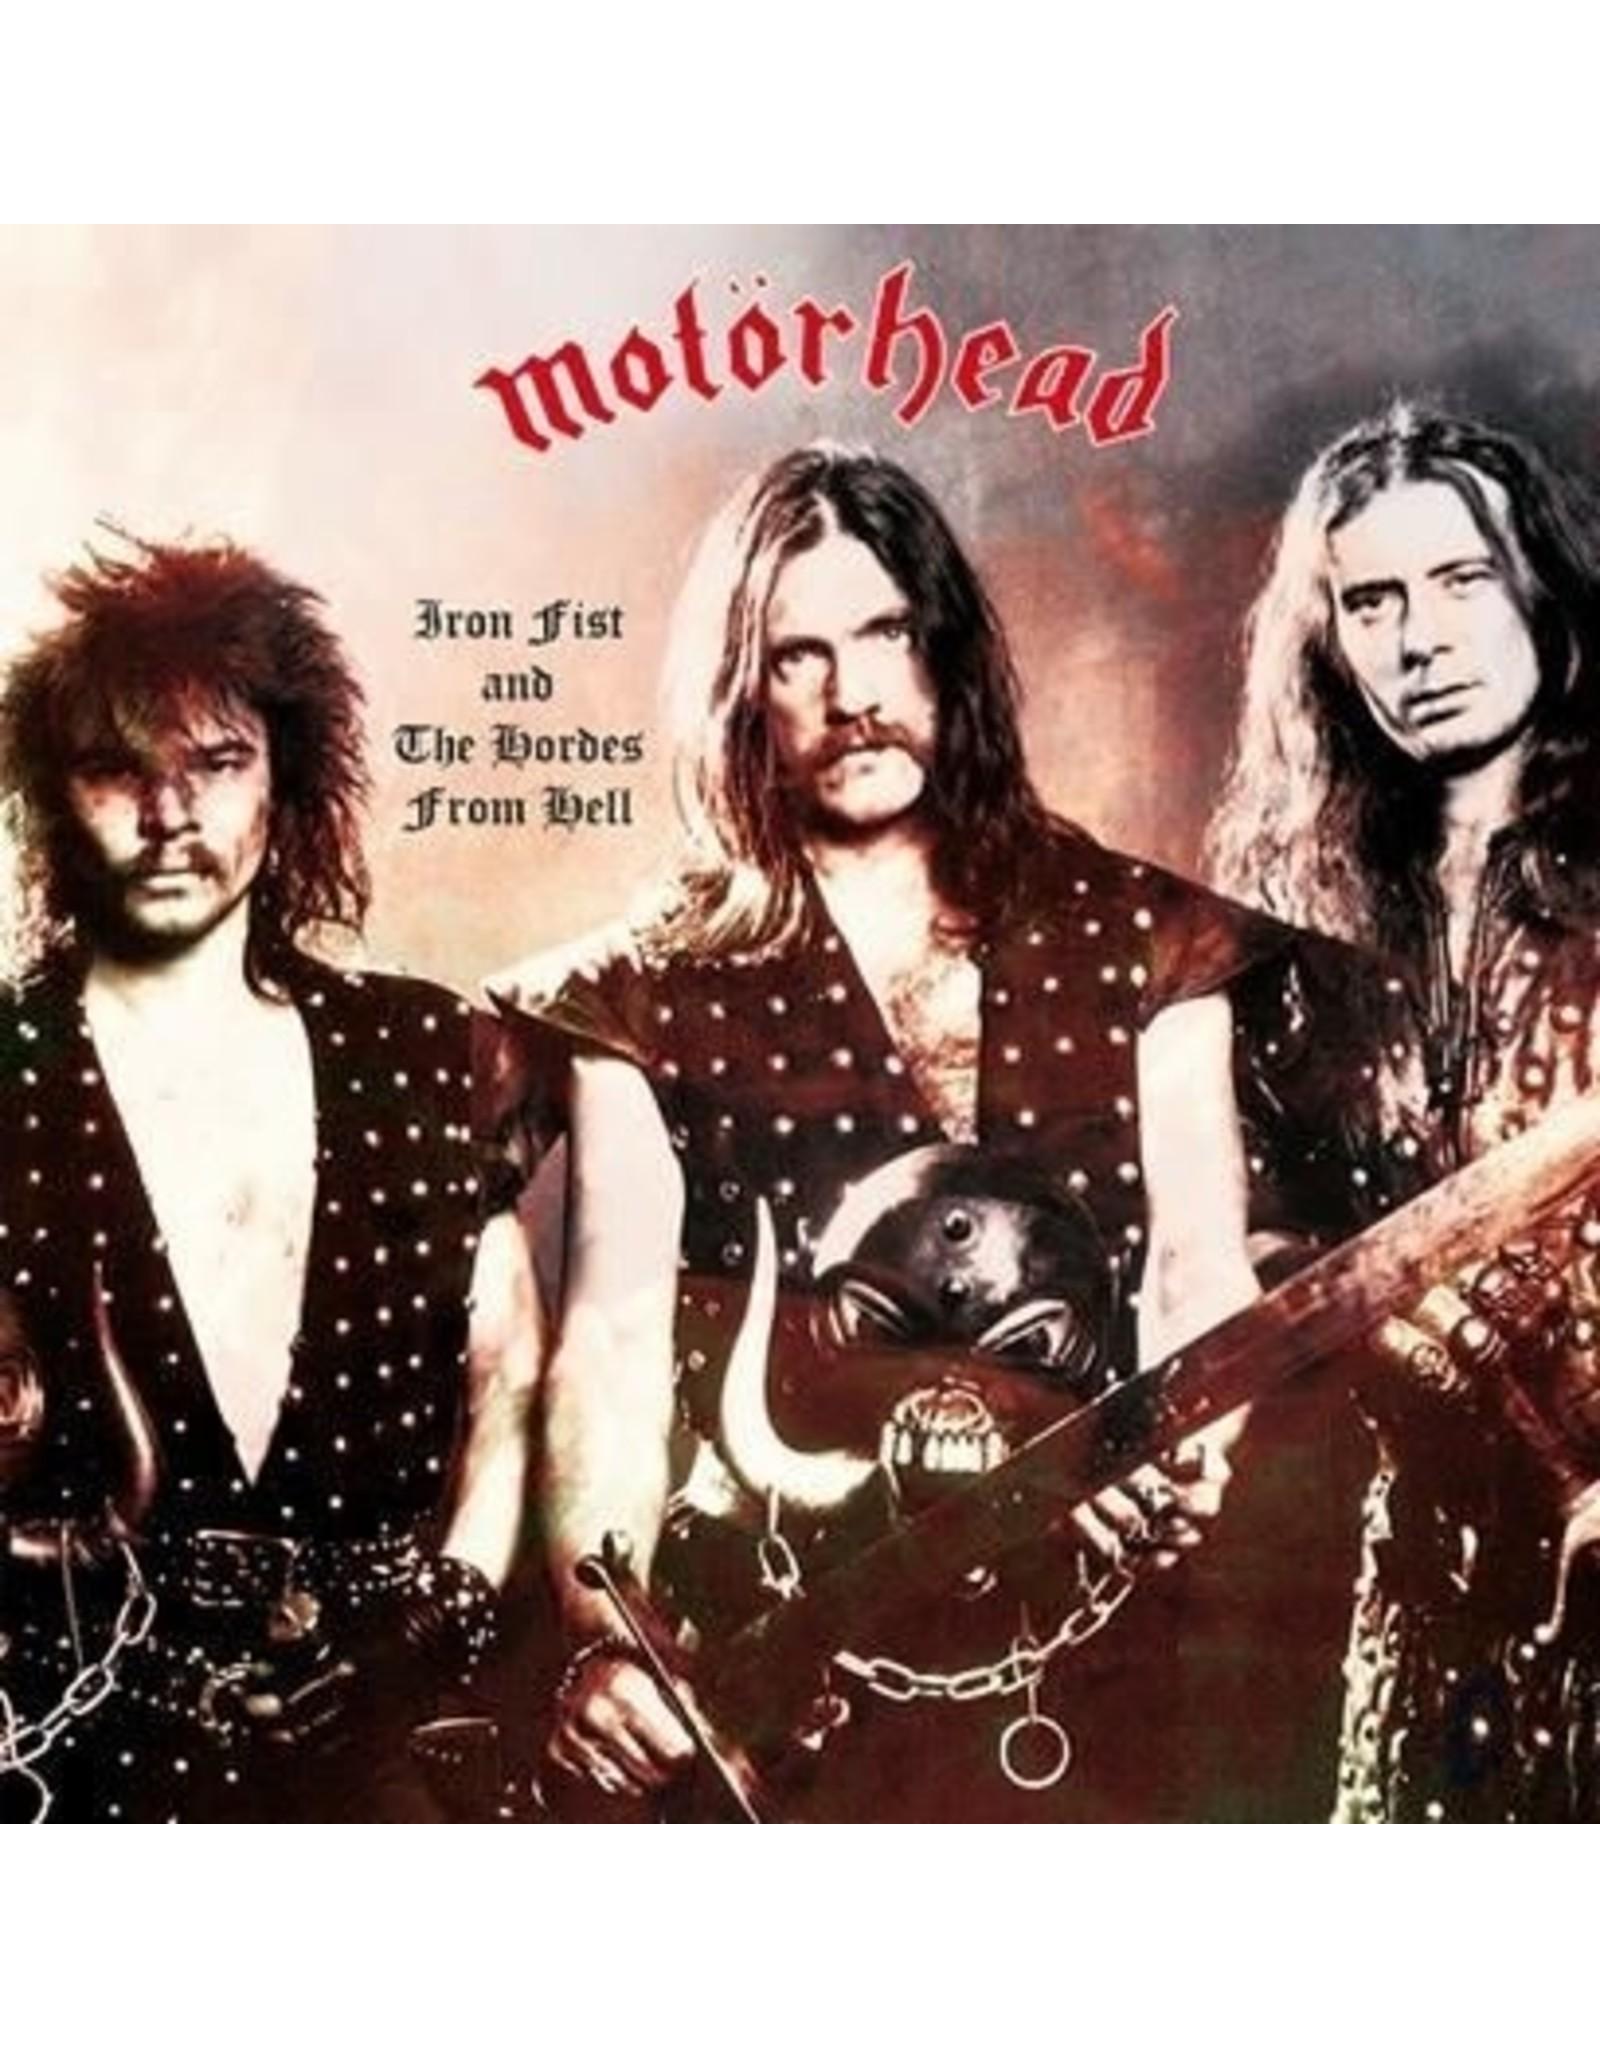 New Vinyl Motorhead - Iron Fist & The Hordes From Hell LP